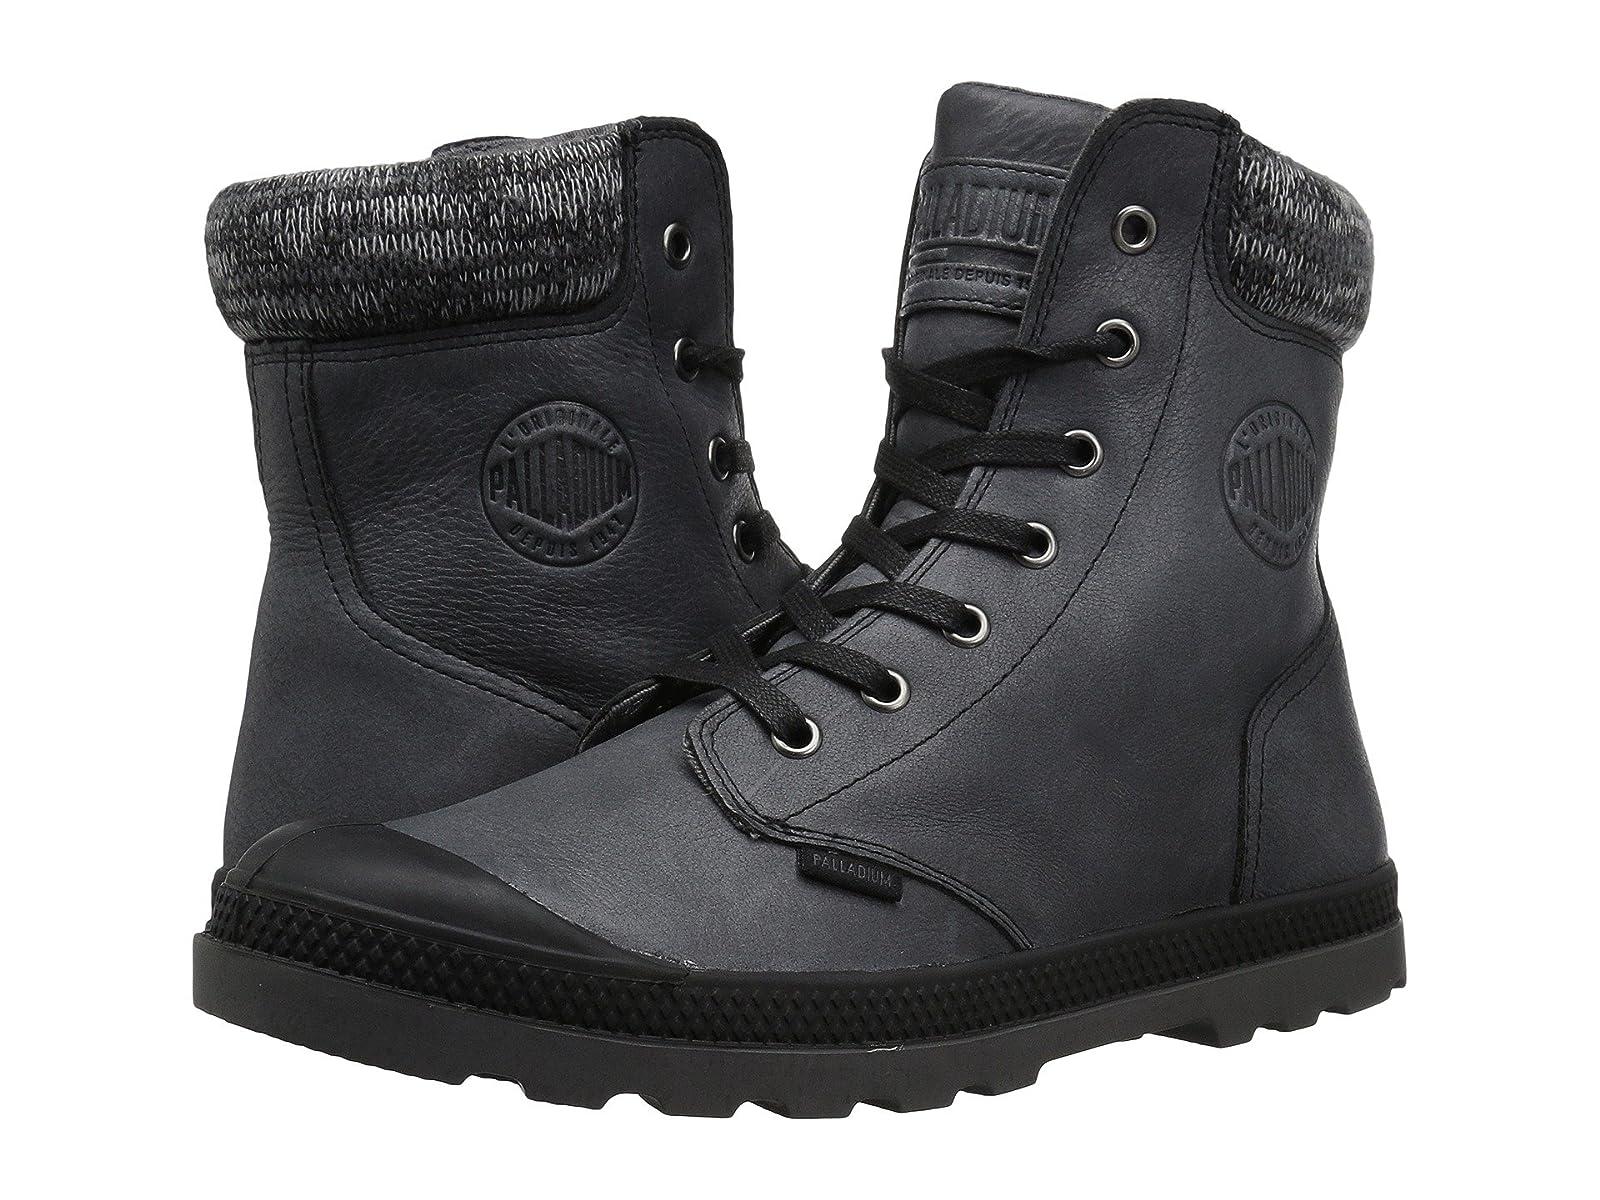 Palladium Pampa Hi Knt LPCheap and distinctive eye-catching shoes